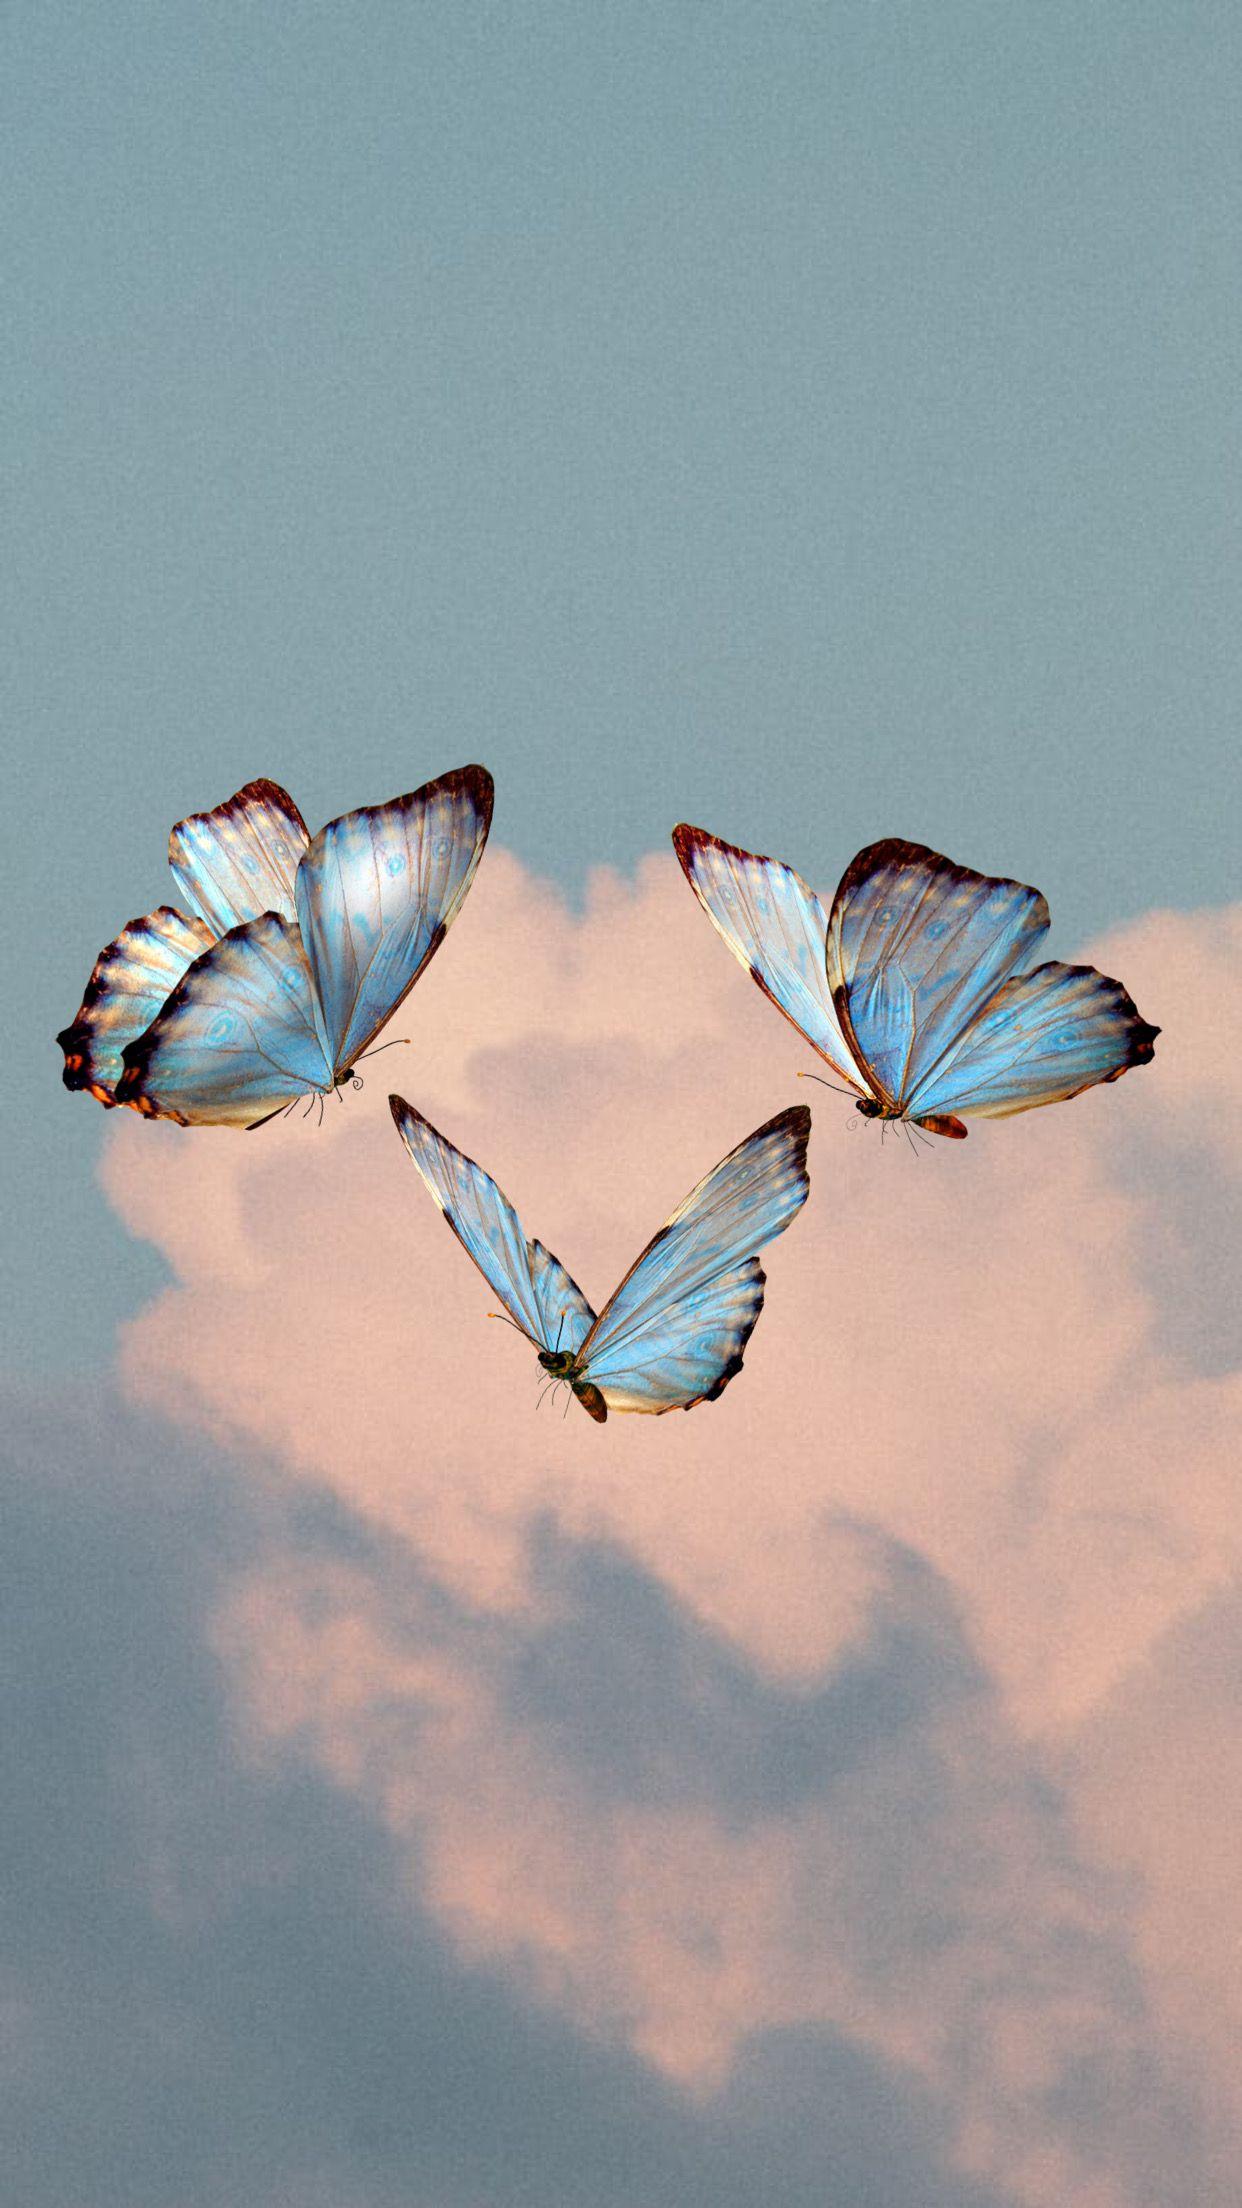 Aesthetic Butterfly Wallpaper Laptop : aesthetic, butterfly, wallpaper, laptop, Wallpaper, #cute, #butterfly, #aesthetic, #iphone, #iphonewallpapers, Butterfly, Backgrounds,, Wallpaper,, Iphone